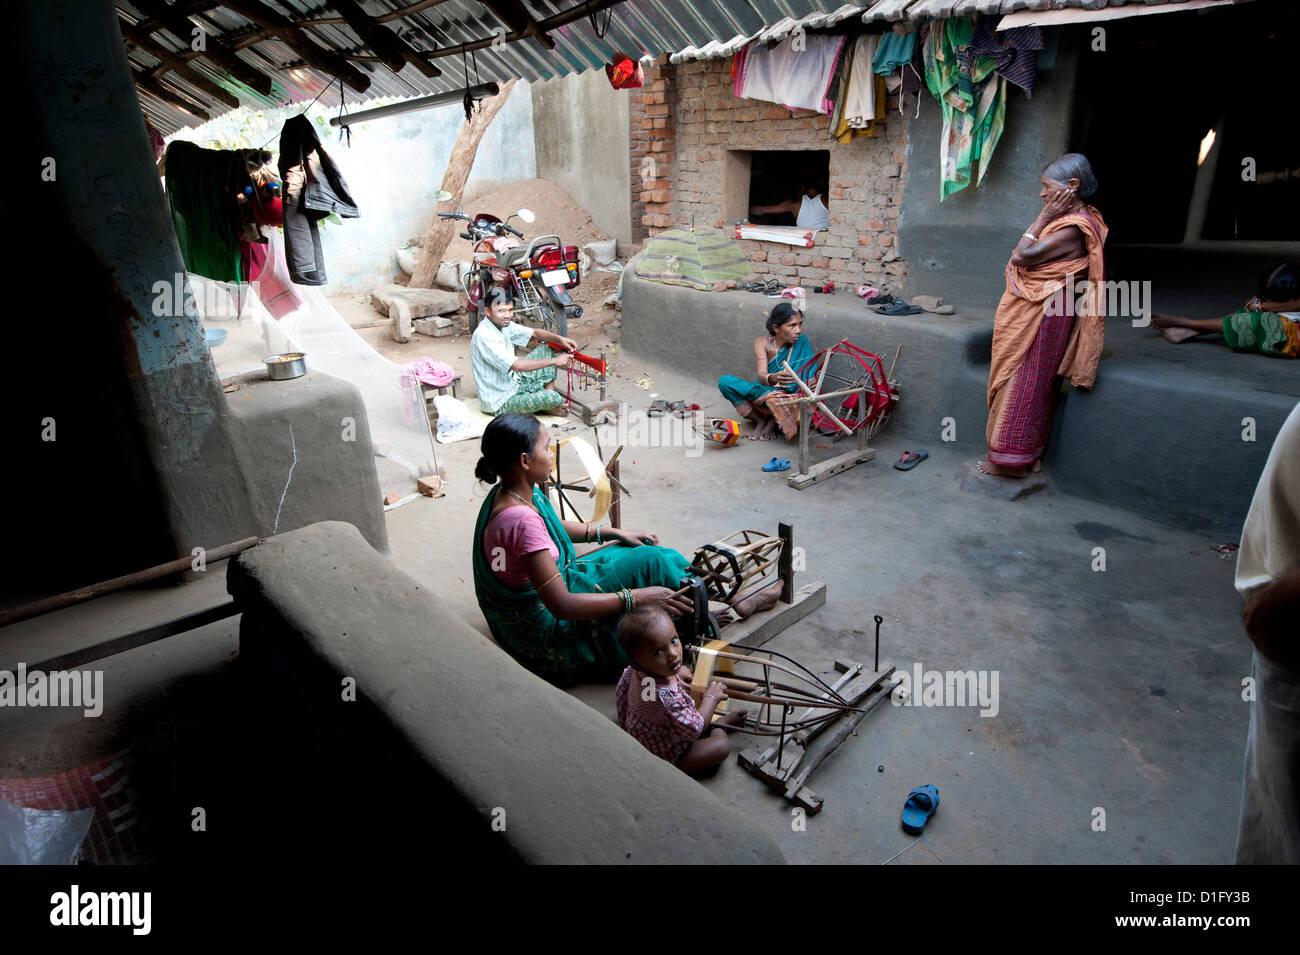 Frauen in kommunalen Hinterhof des Webens Dorf, Seidenfaden Spinnerei, Weberei Dorf Vaidyanathpur, Orissa, Indien Stockbild